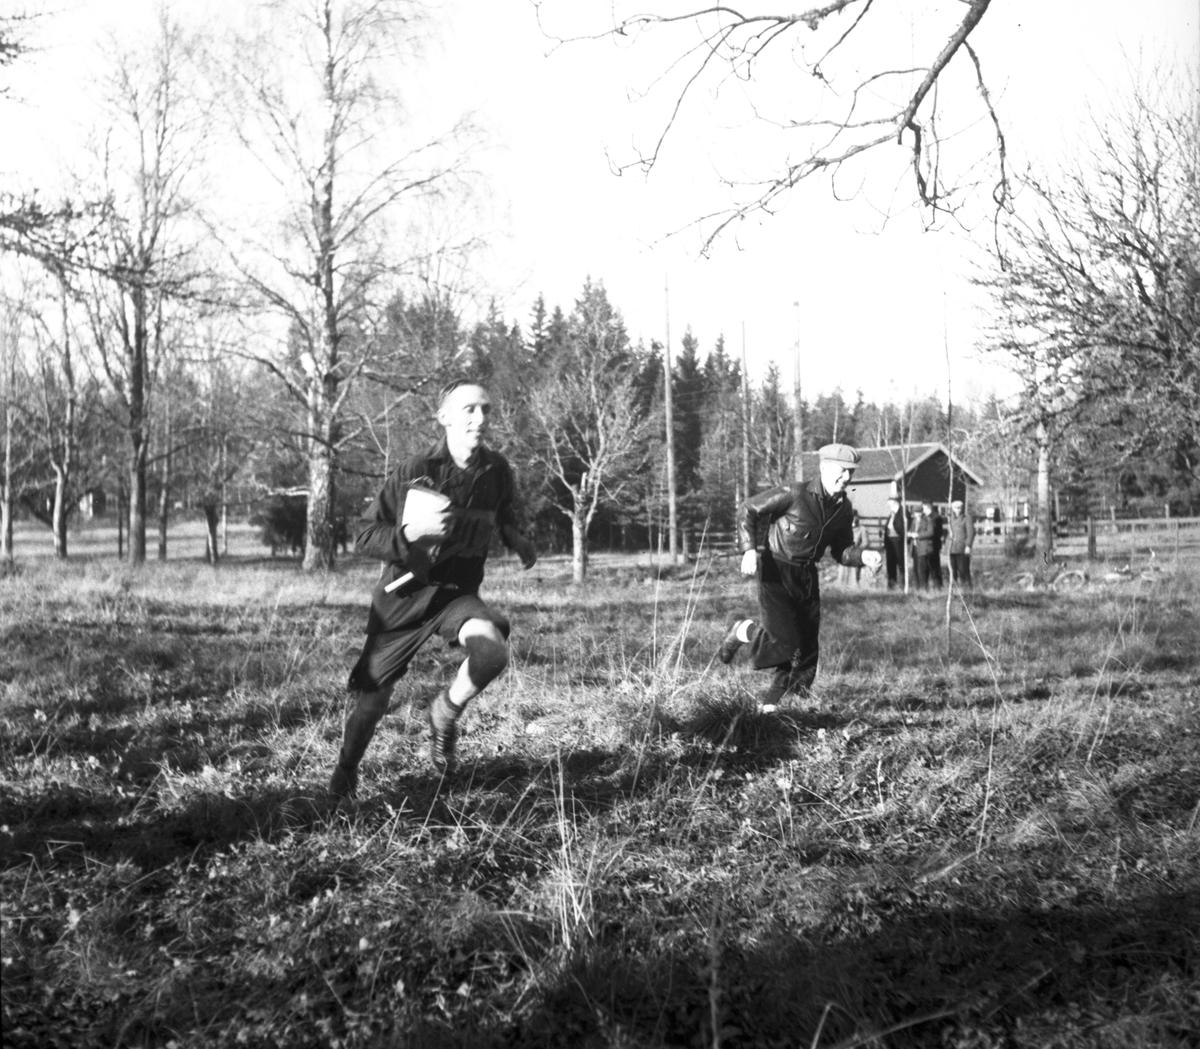 DM i budkavle till fots. 1938